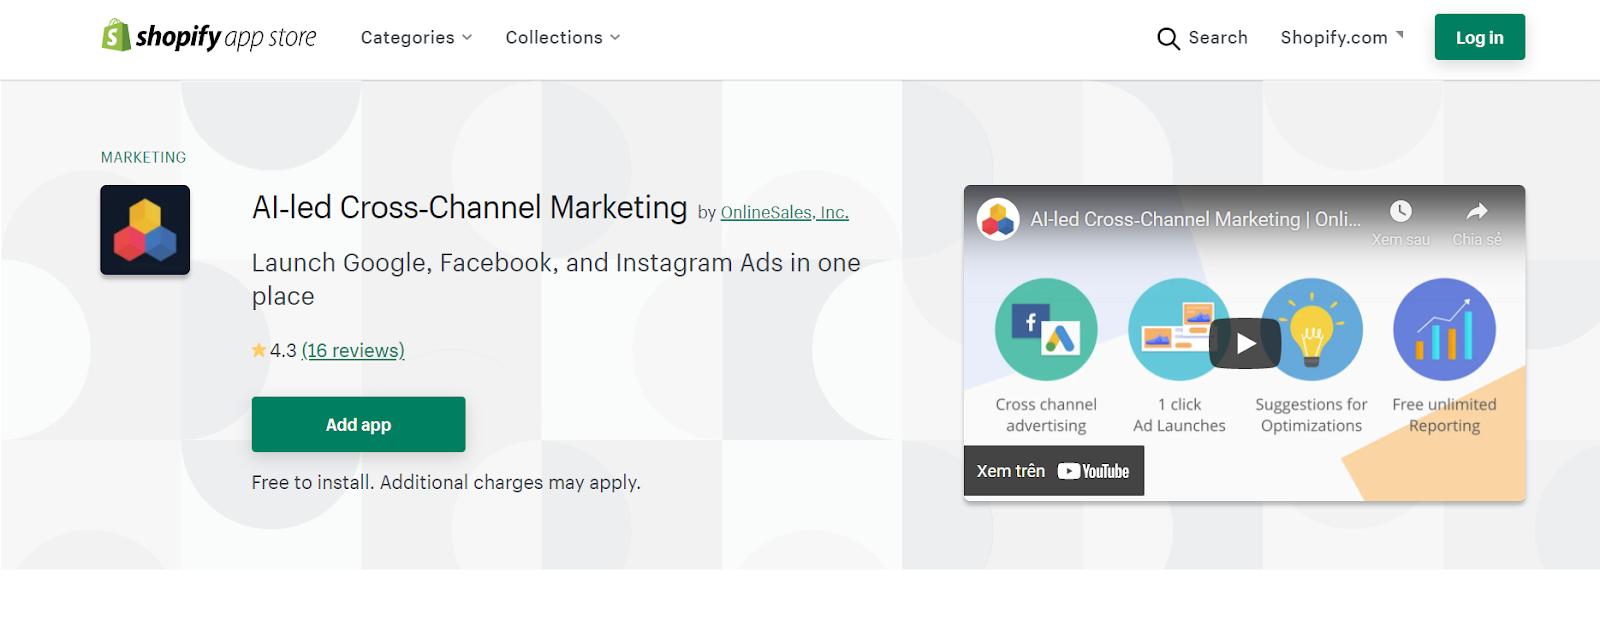 ai-led cross-channel marketing shopify app